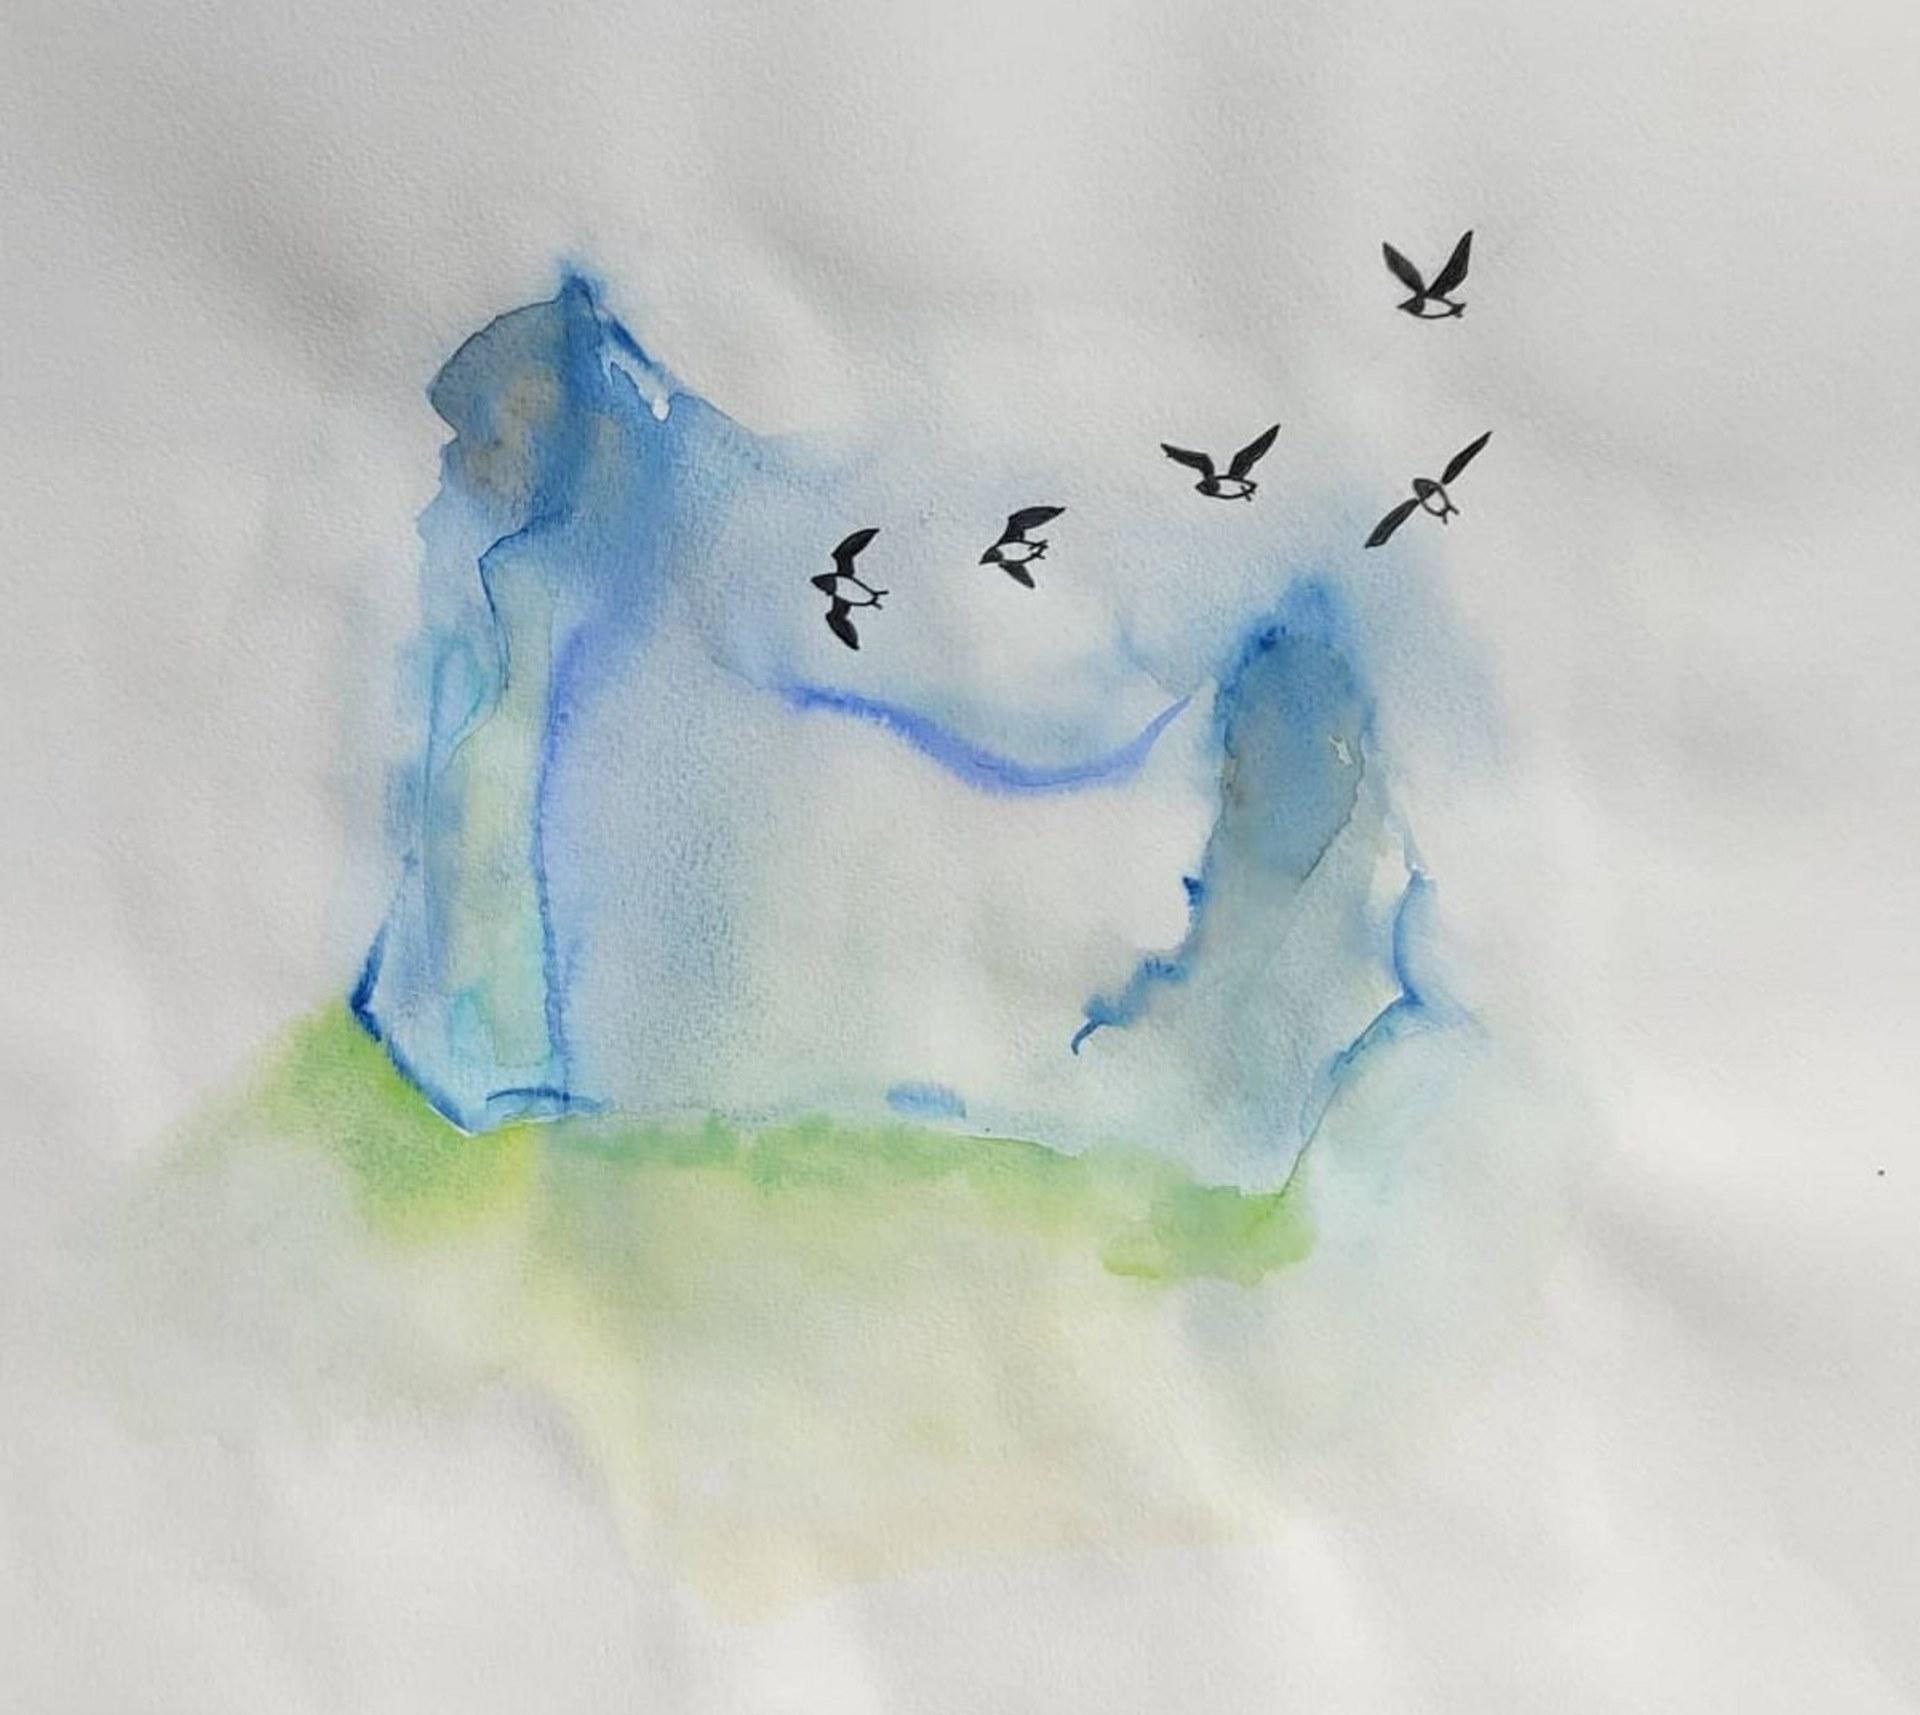 Iceberg with Sea kings. 42 x 29 cm.